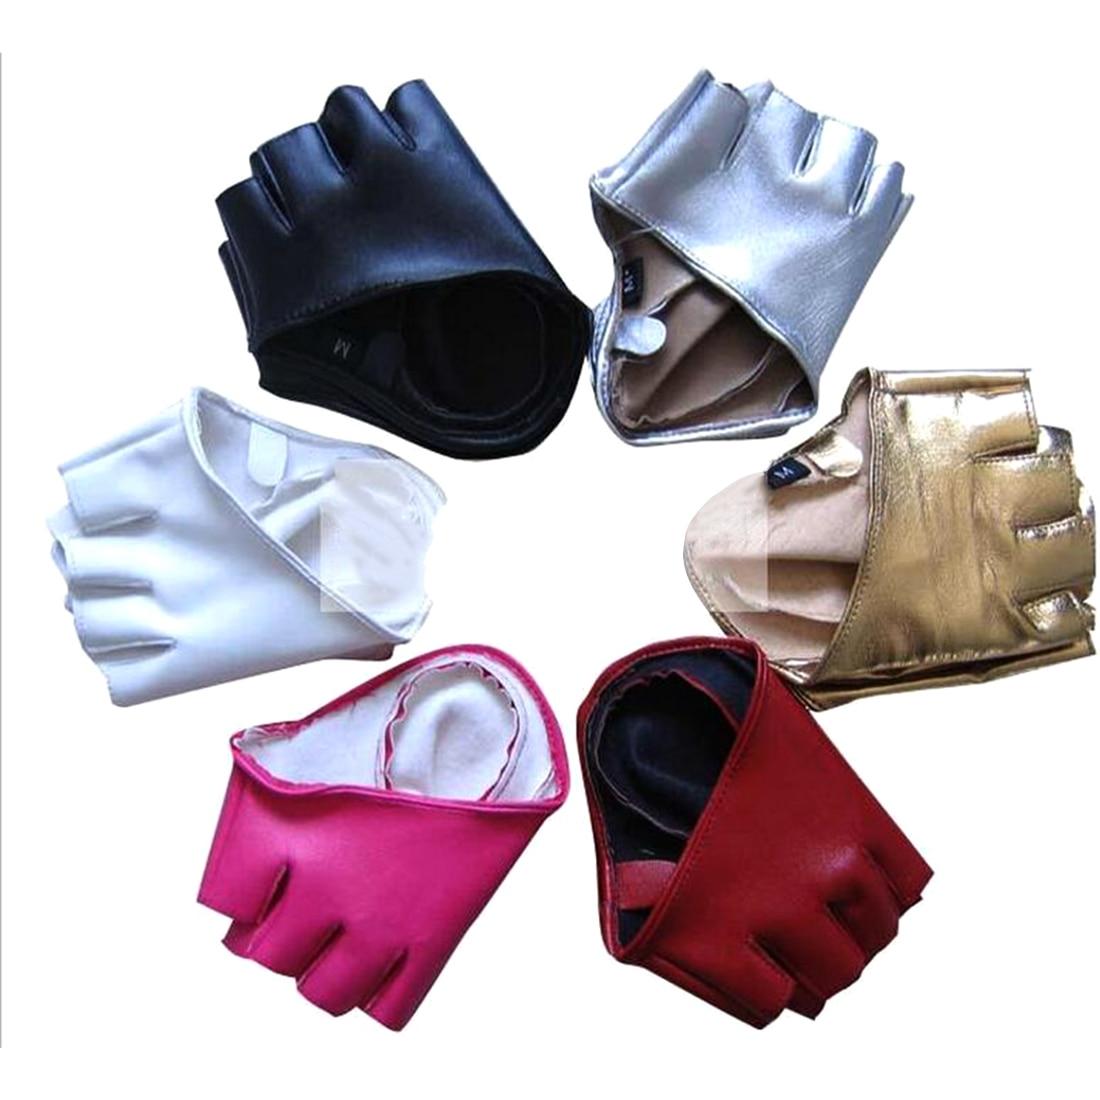 2018 New Fashion Women's Leather Gloves Half Finger Gloves Fingerless Driving Show Jazz Gloves Pole Dance Performance Gloves Hot